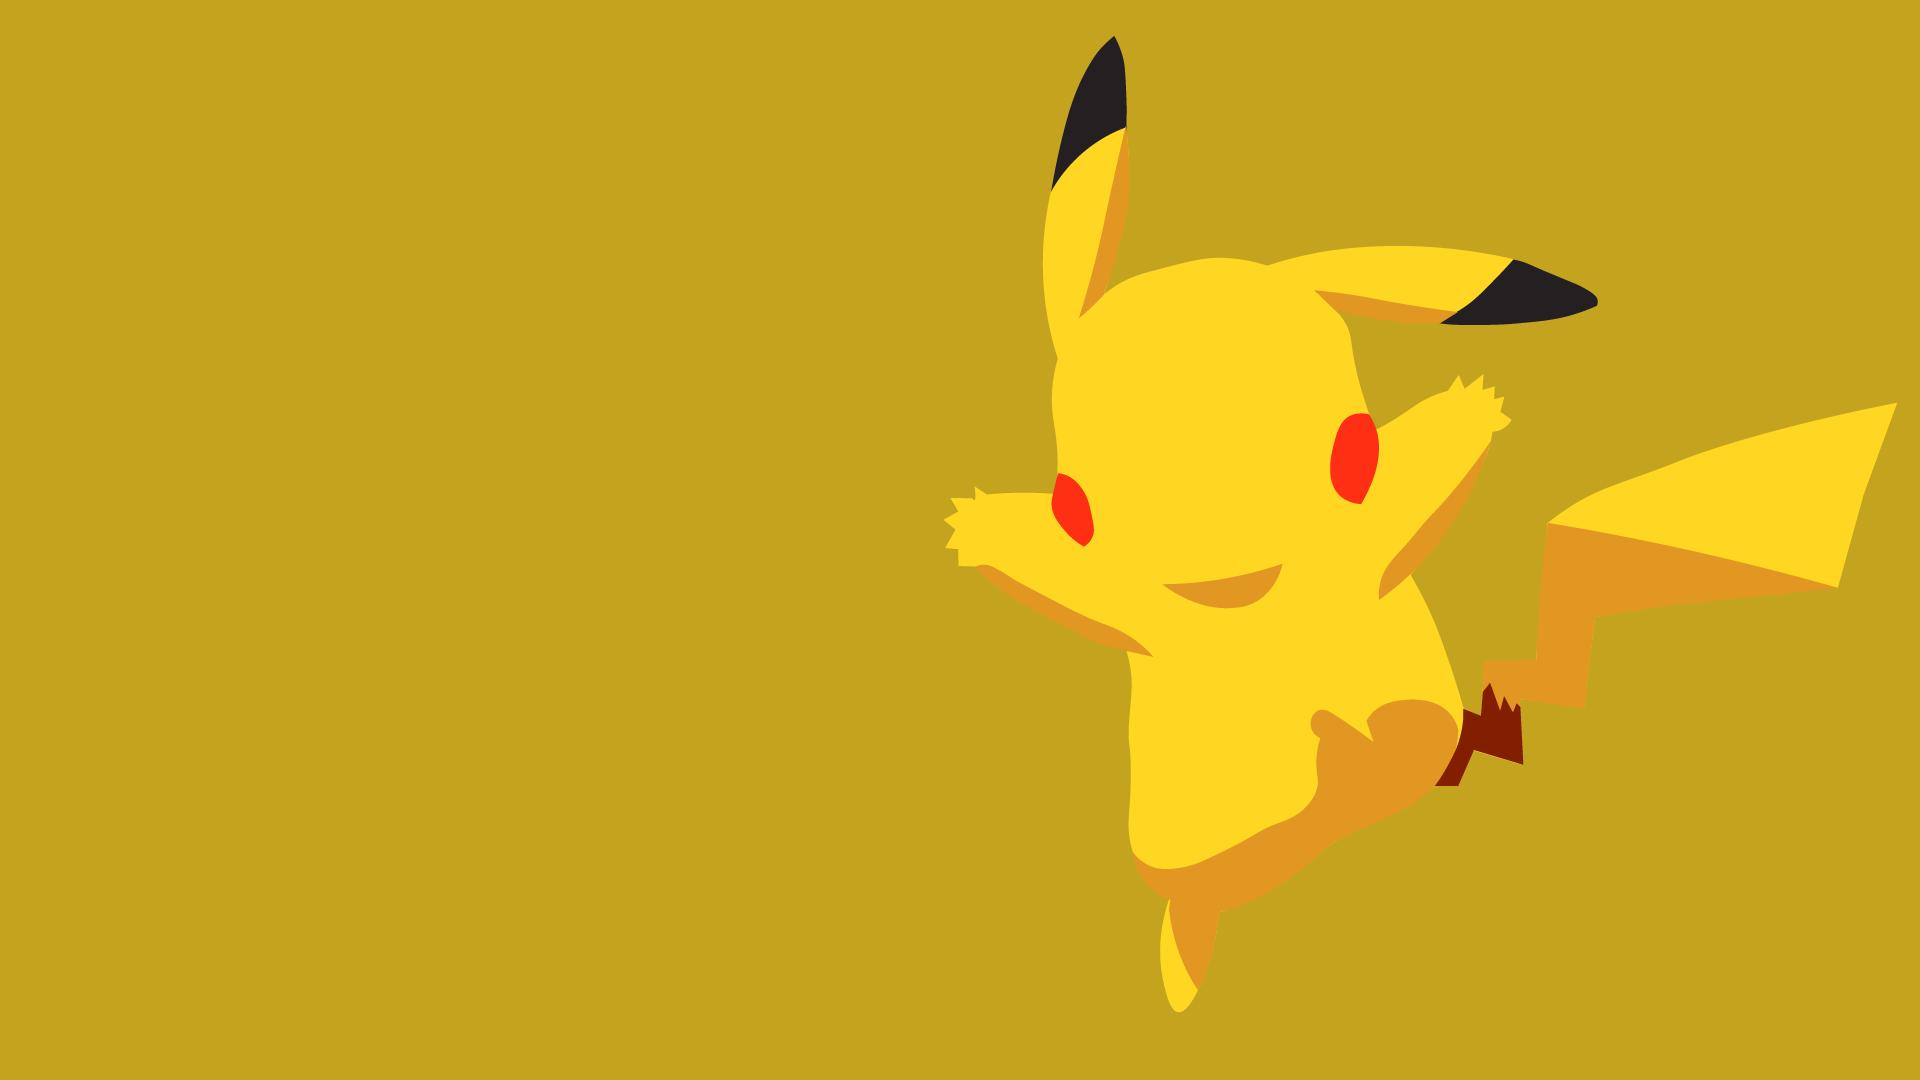 5053622 Pokemon Pikachu Wallpaper And Background Pikachu Fond D Ecran 1920x1080 Wallpaper Teahub Io